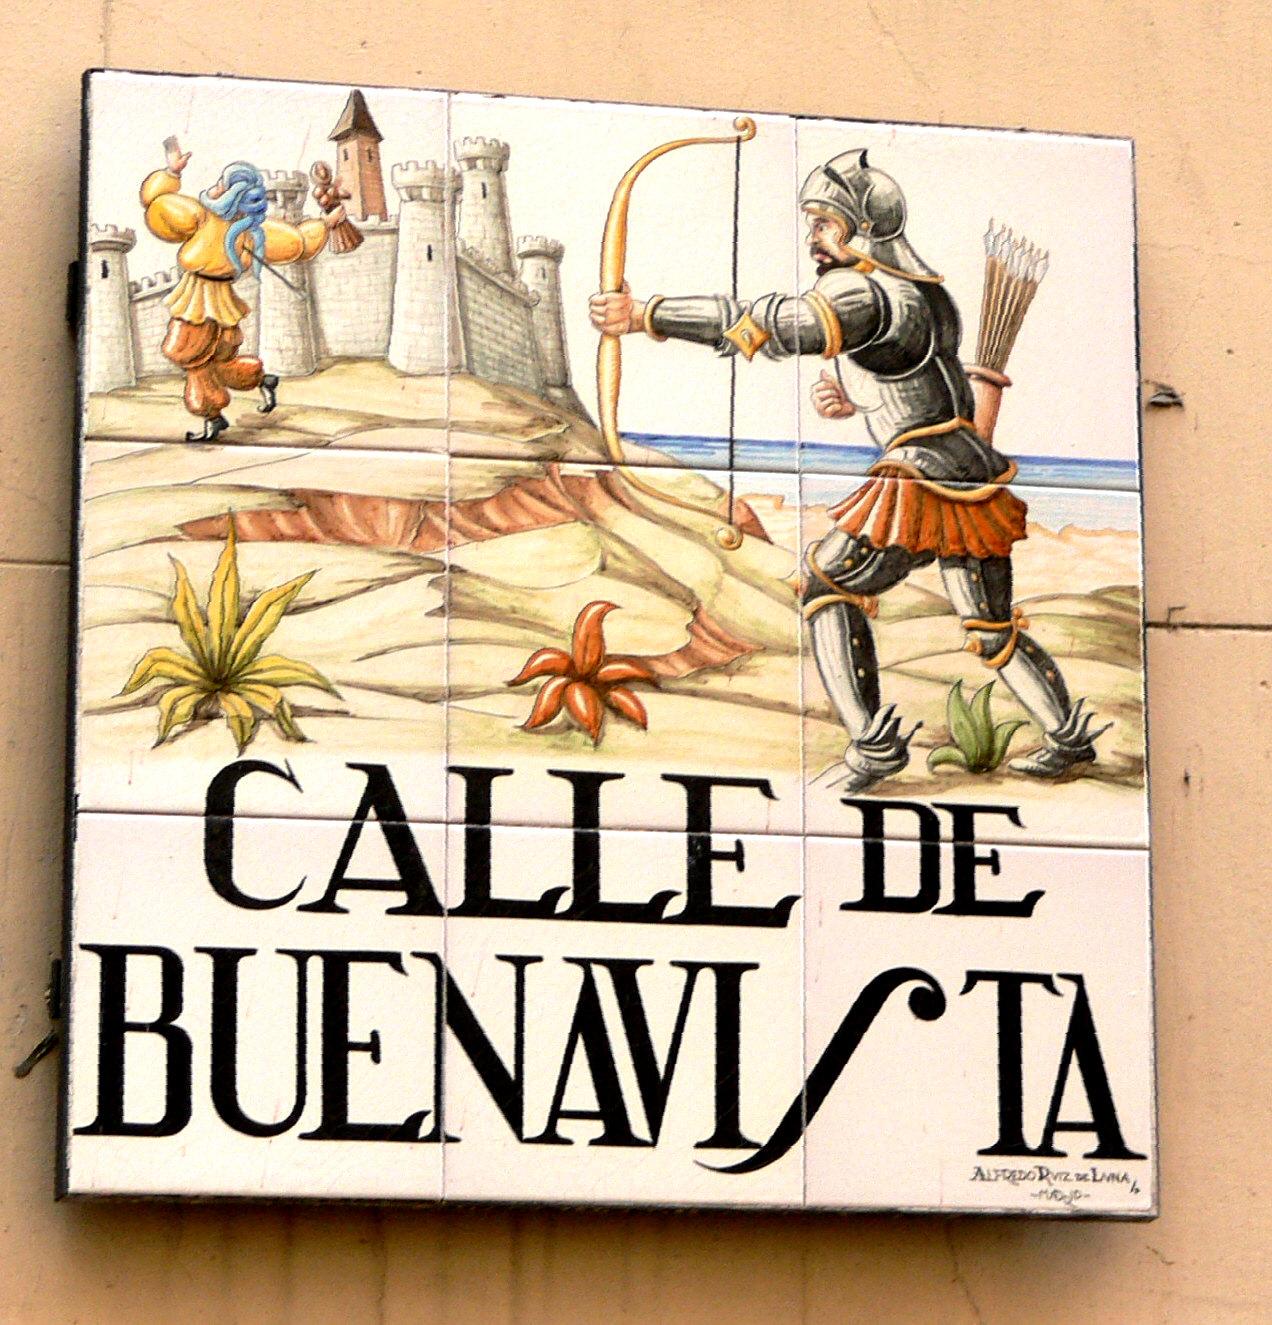 La Calle Buenavista, Madrid